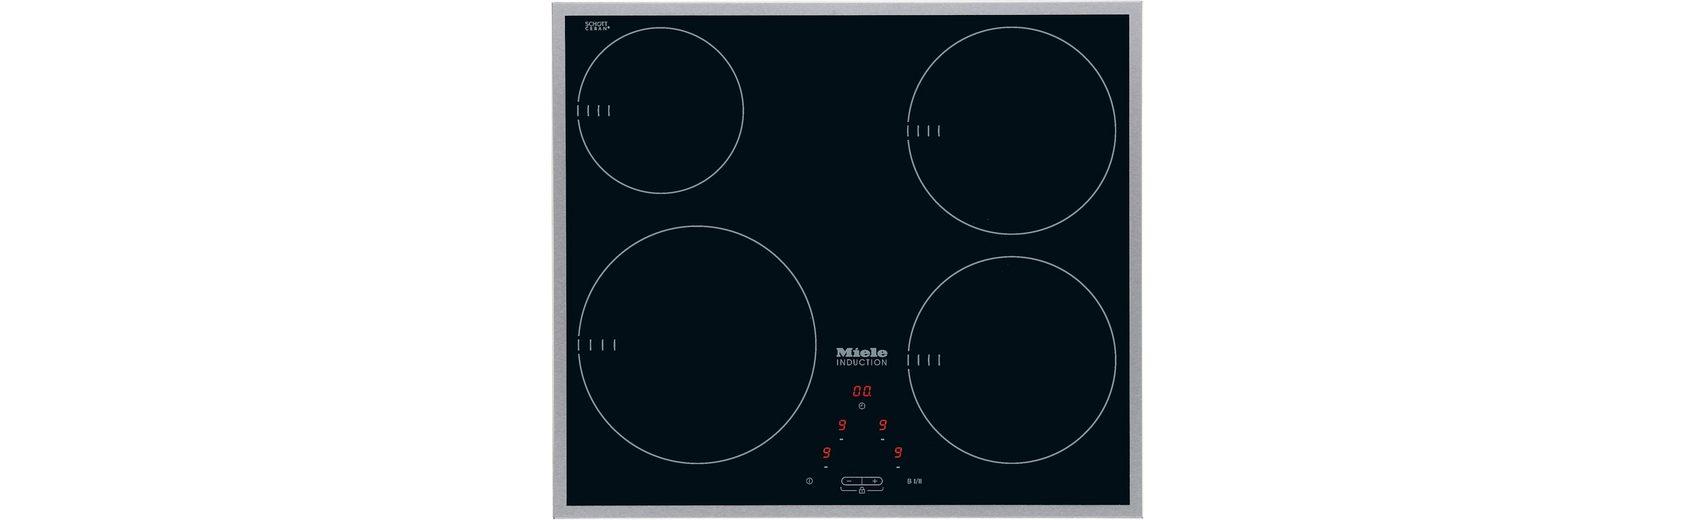 Miele Autarkes Induktions-Kochfeld von Schott Ceran® KM 6115